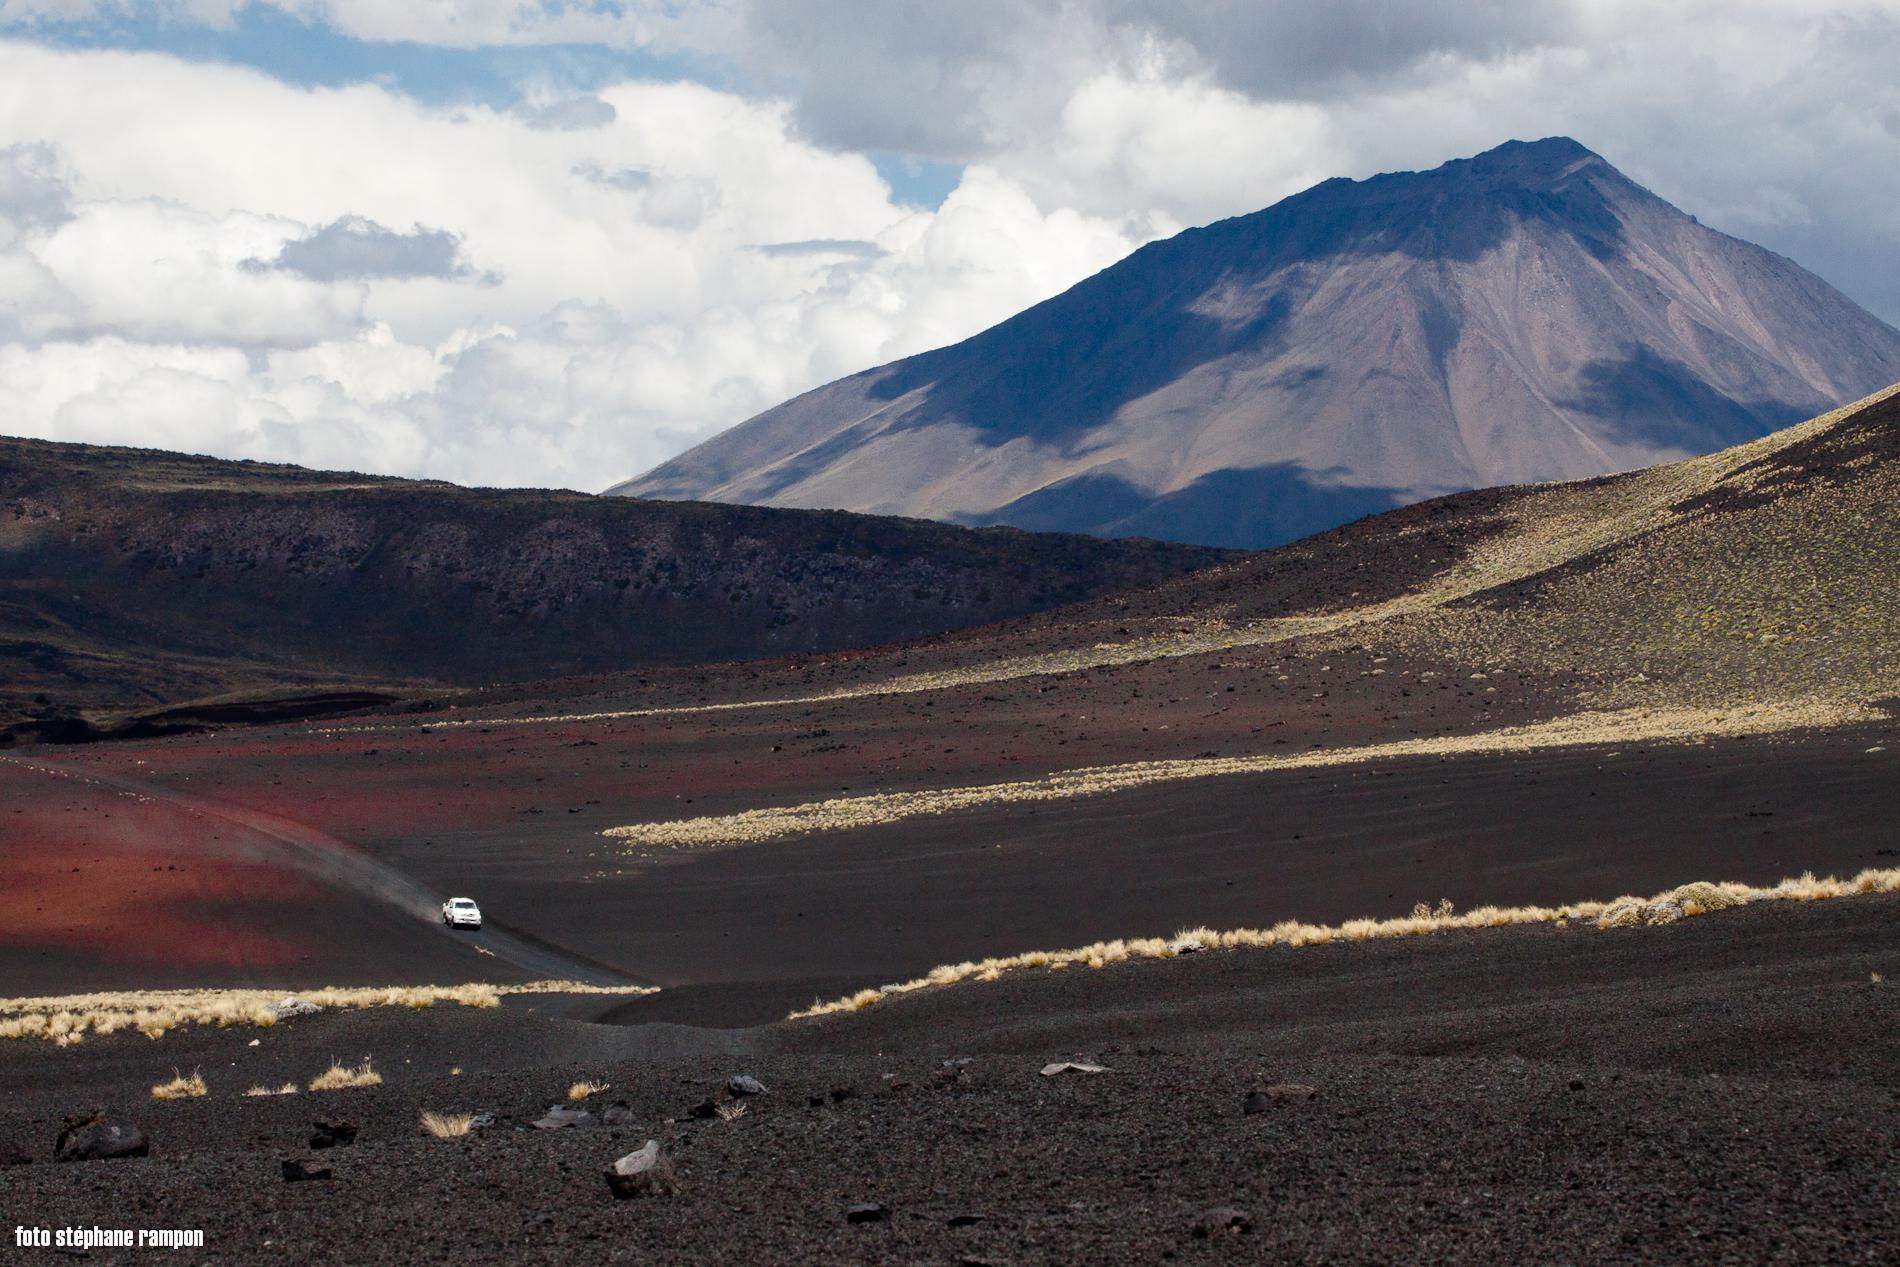 wine-TROTTERS_oenotourisme_wine-tourism-agency_tour_vino_vin_turismo_ARGENTINA_Mendoza_trekking_hiking_horseback-riding_alta-montana_Andes_58.jpg